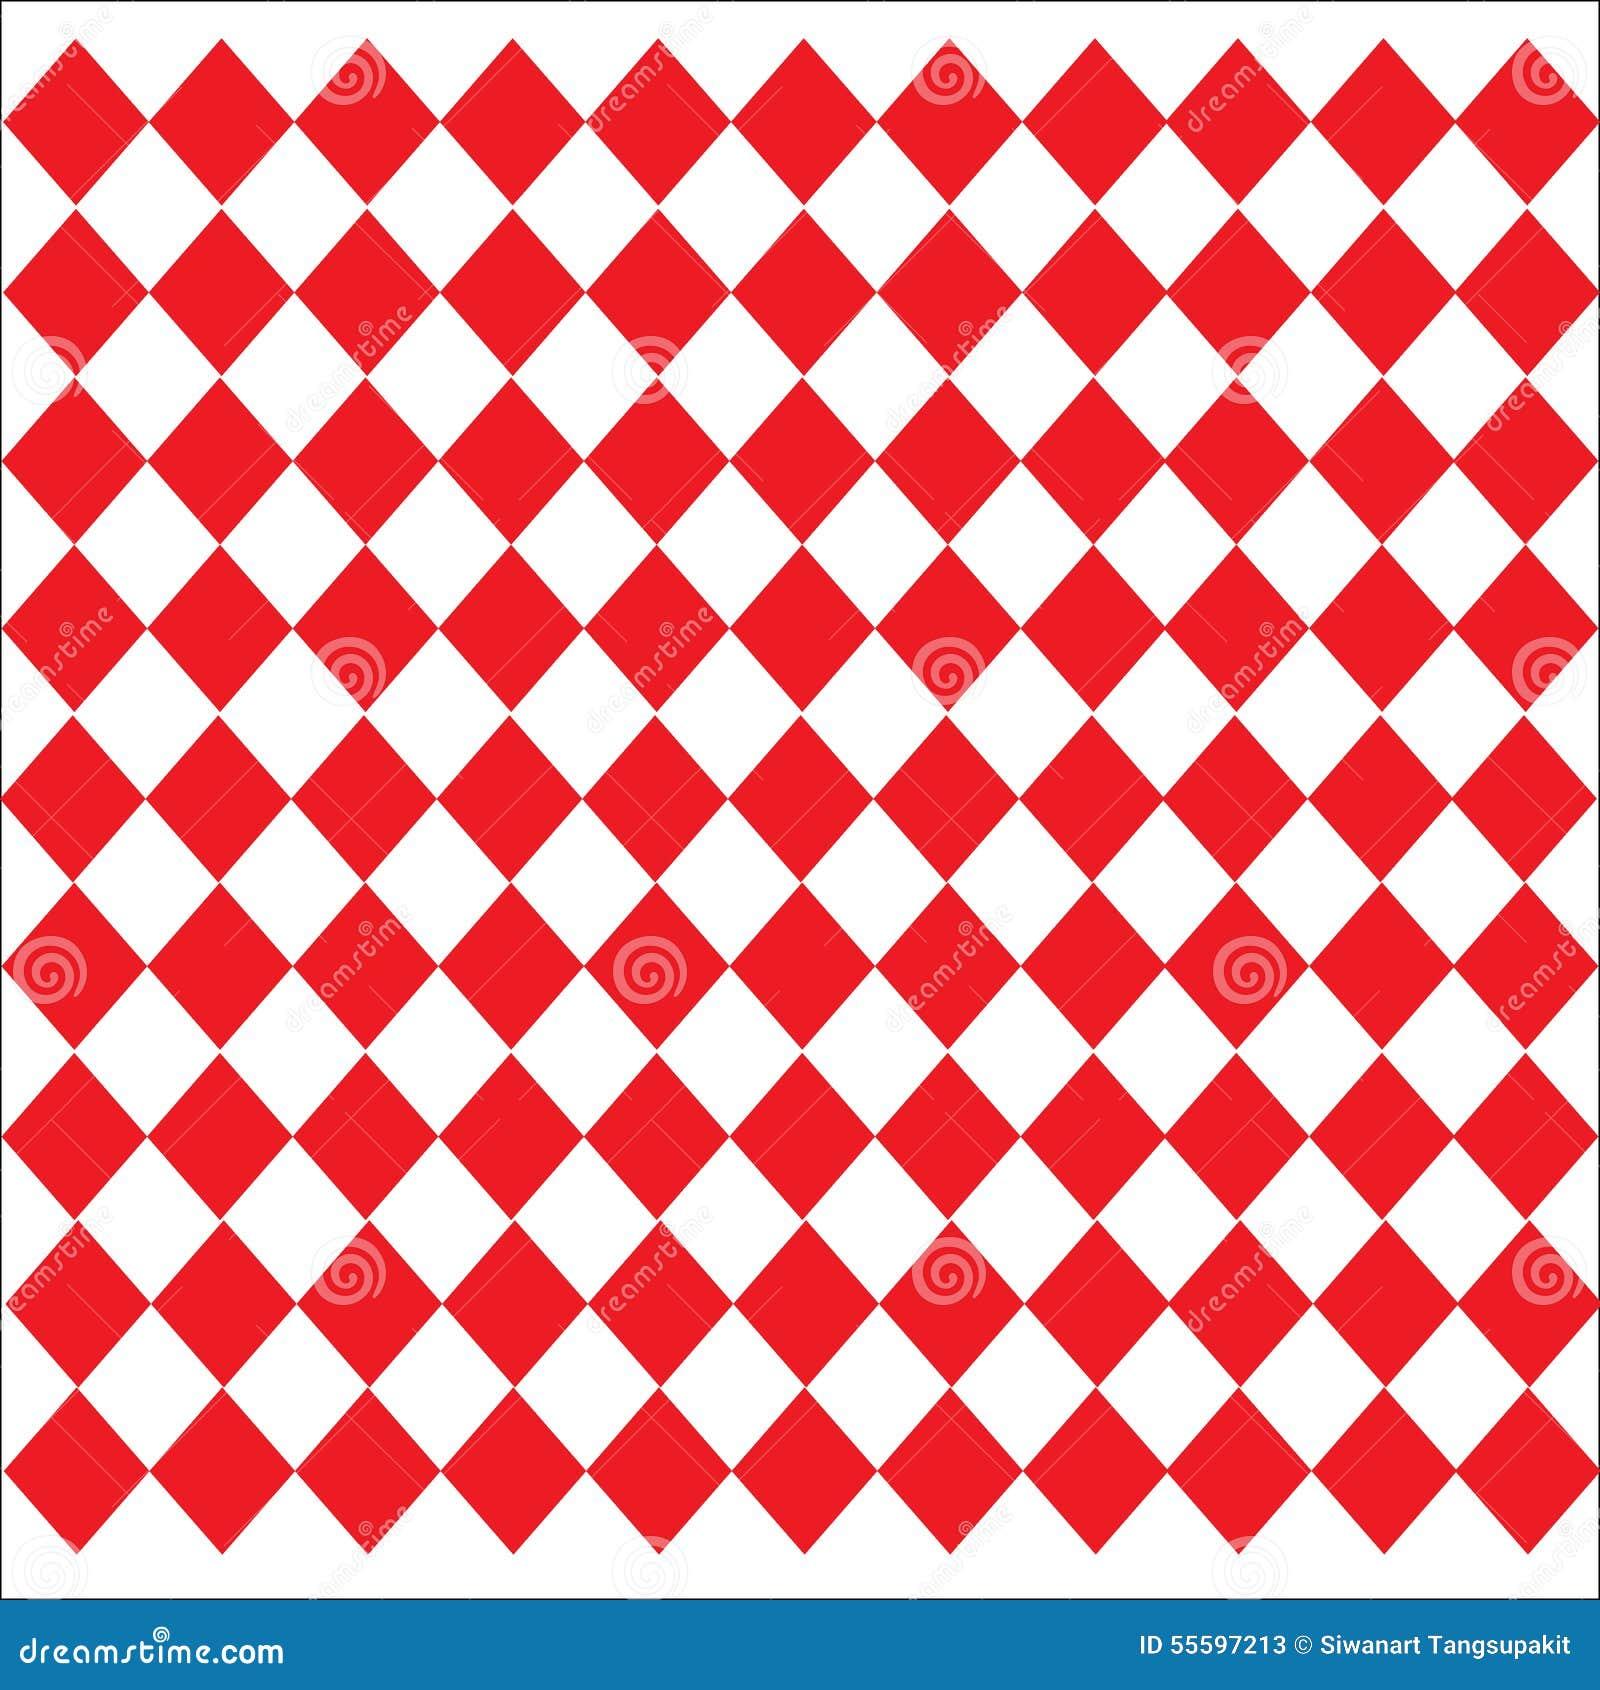 red diamonds background-#43